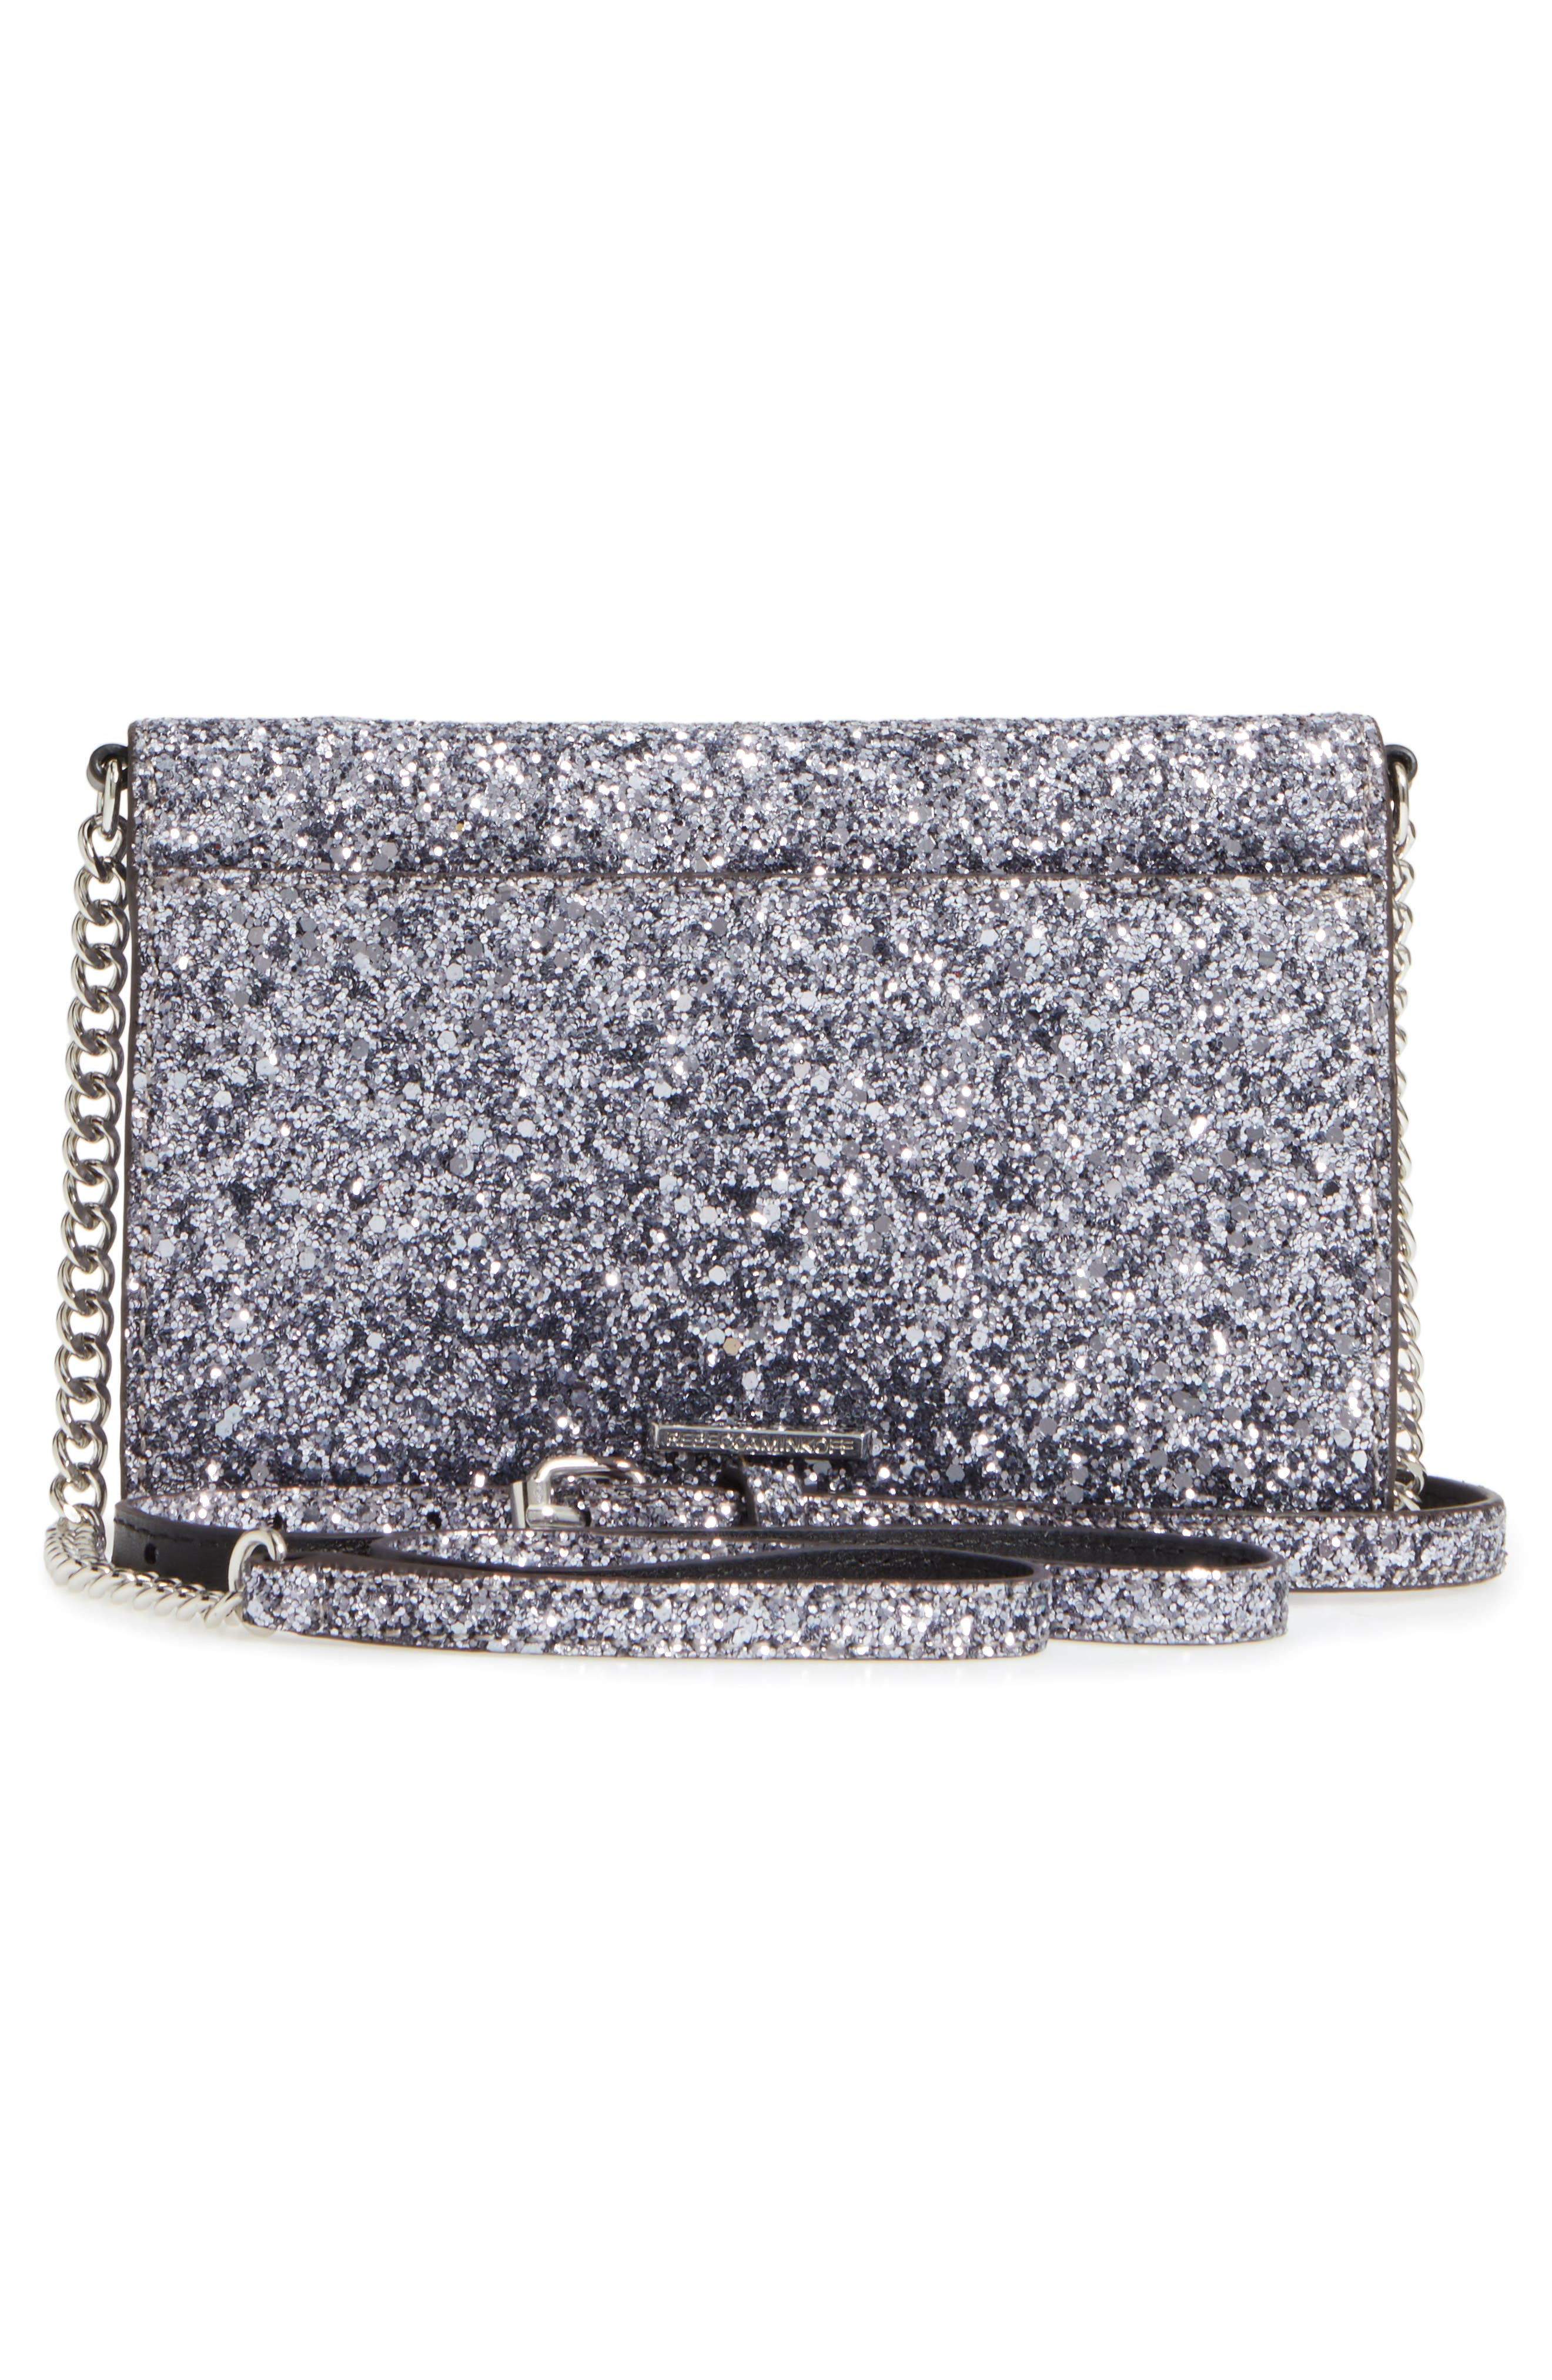 Molly Crossbody Bag,                             Alternate thumbnail 3, color,                             Silver